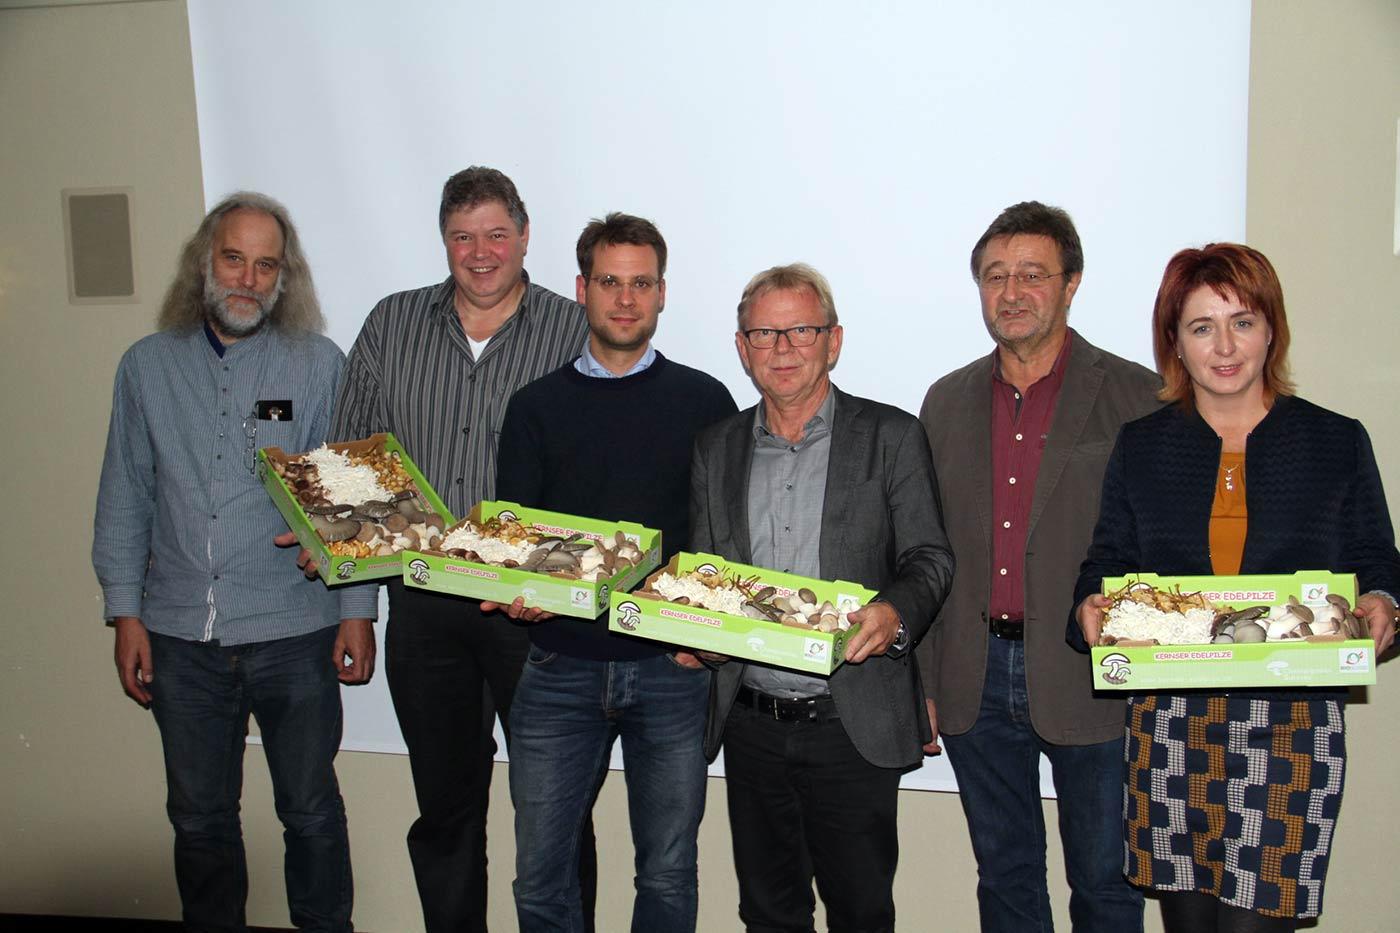 Die Akteure der HLP-Mitgliederversammlung, von links nach rechts: Jürgen Kynast(D), Dr. Johan Baars (NL), Dr. Carsten Gründemann(D), Fritz Burkhalter (CH), Ulrich Groos (D) und Natalie Rangno (D).